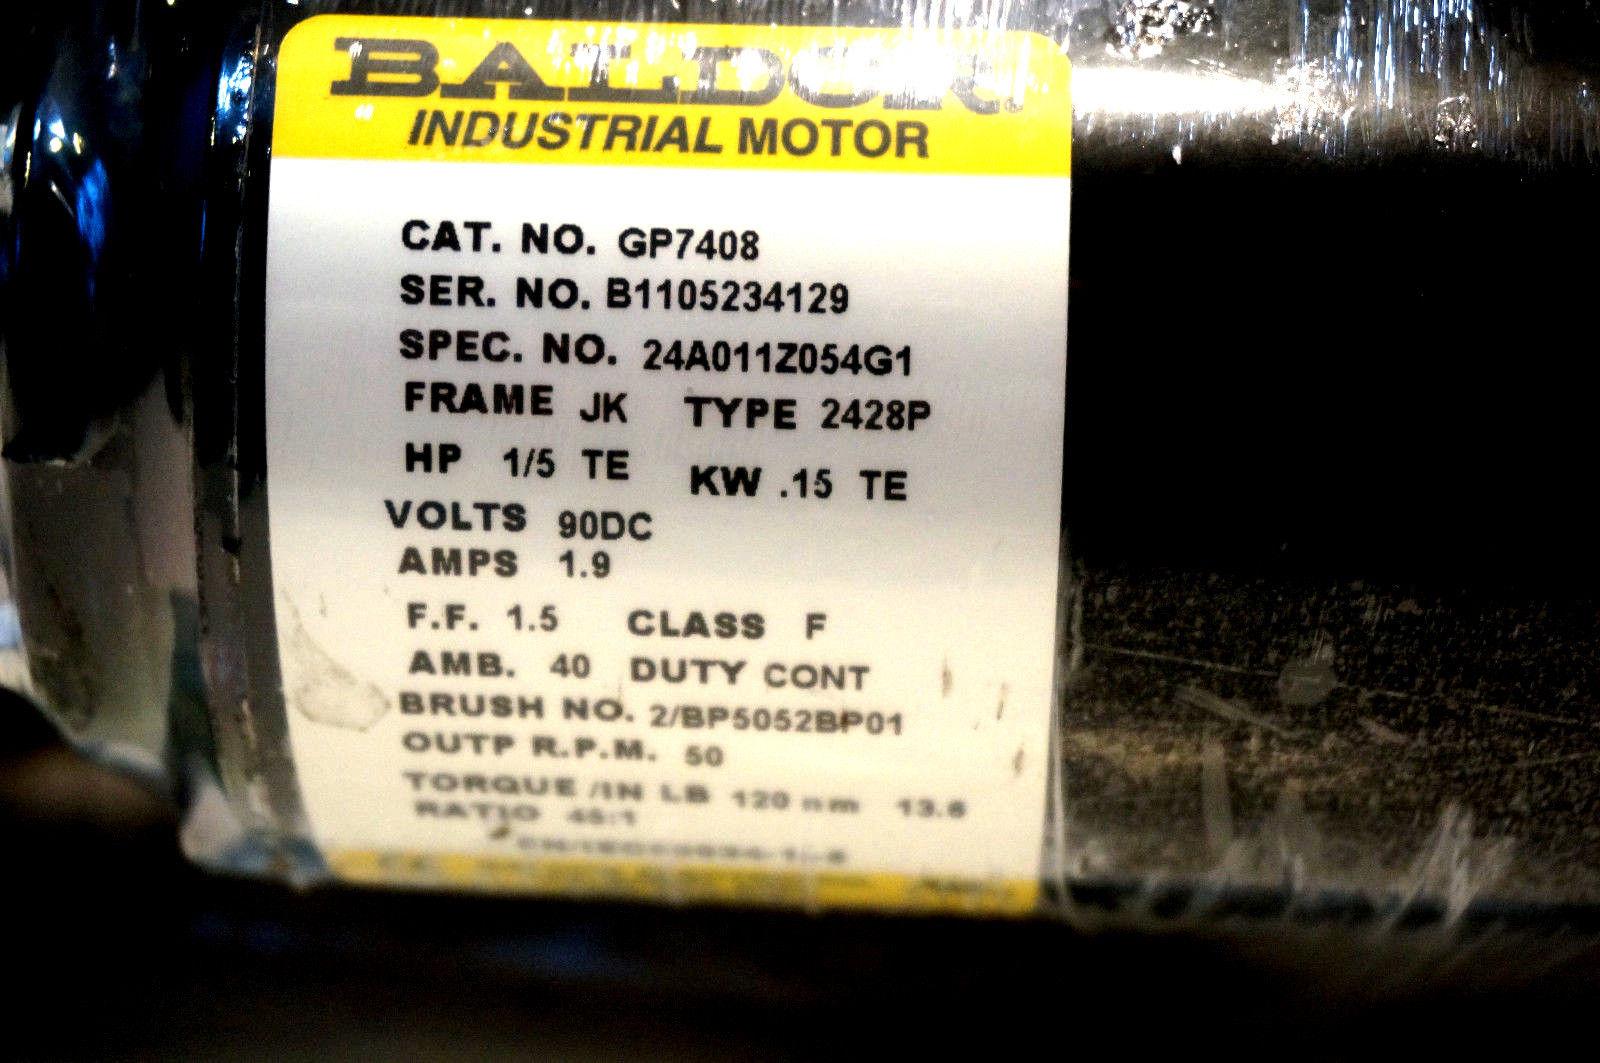 Wiring Motor Electric Leeson Diagram C195t17fb60b Auto Electrical M84t17db1a Diagrams